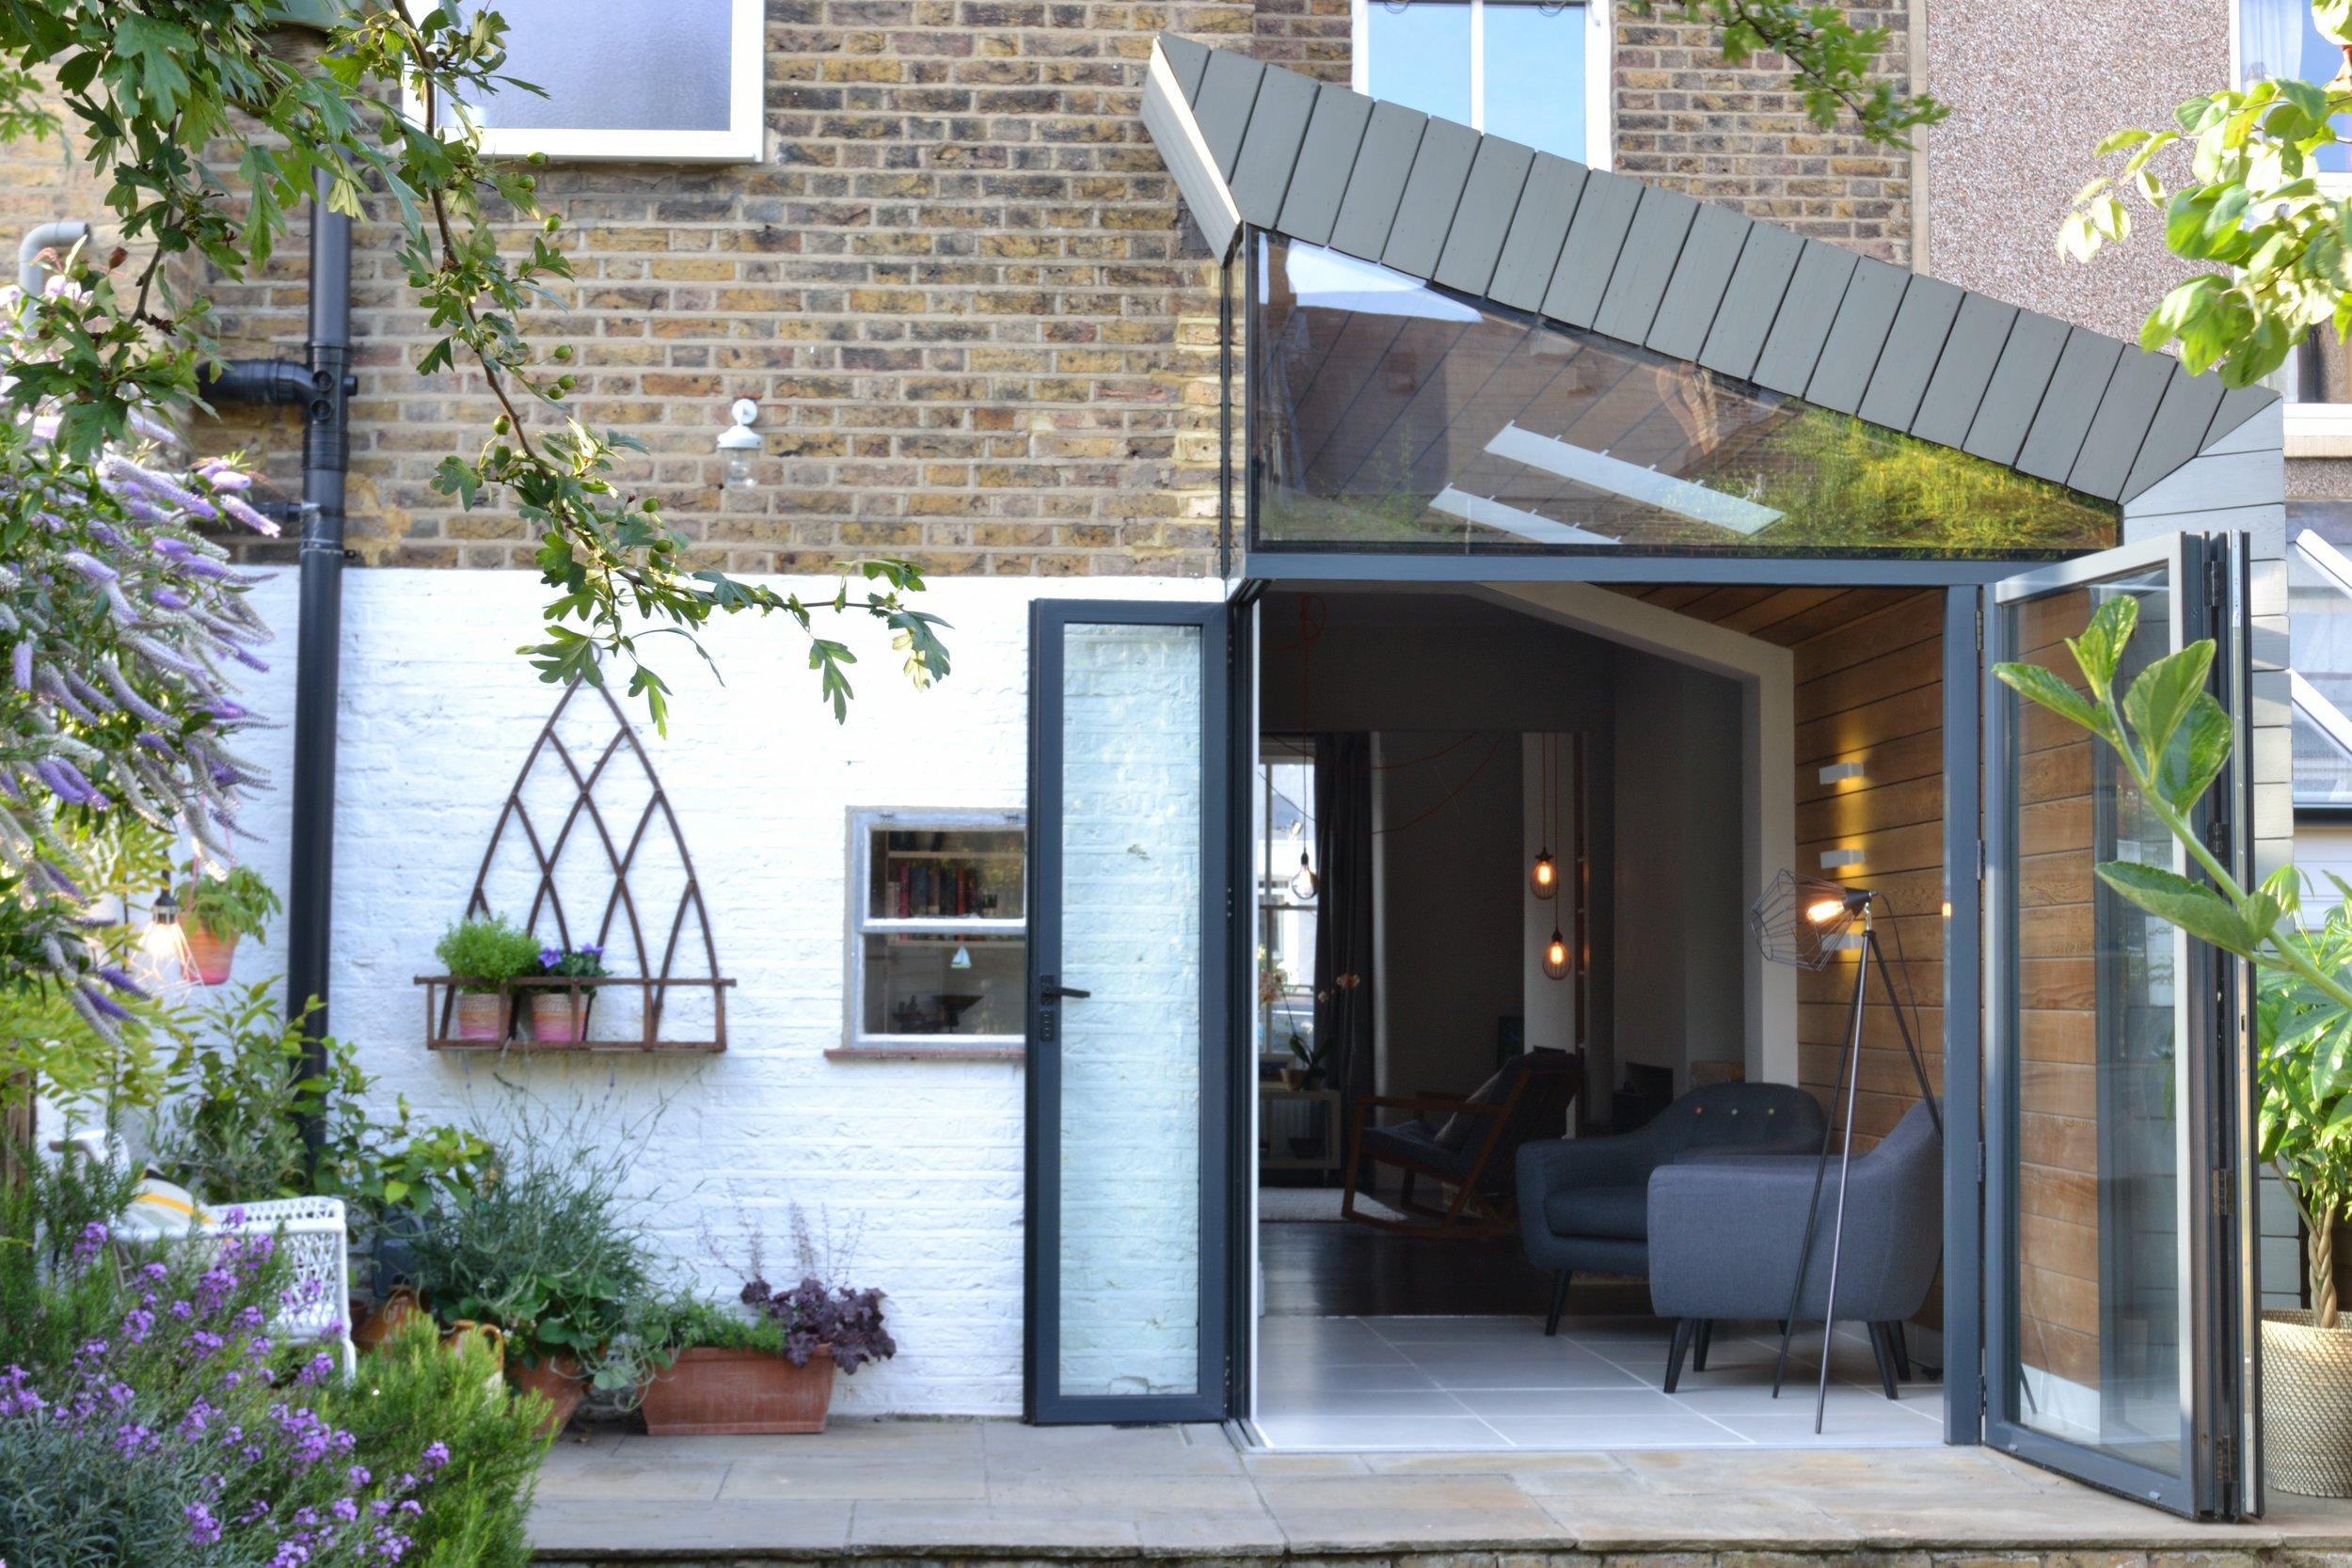 04-whatman-road-victorian-house-extension-architecture-oak-cladding-bi-fold-doors-south-east-london-uk-rider-stirland-architects.jpg